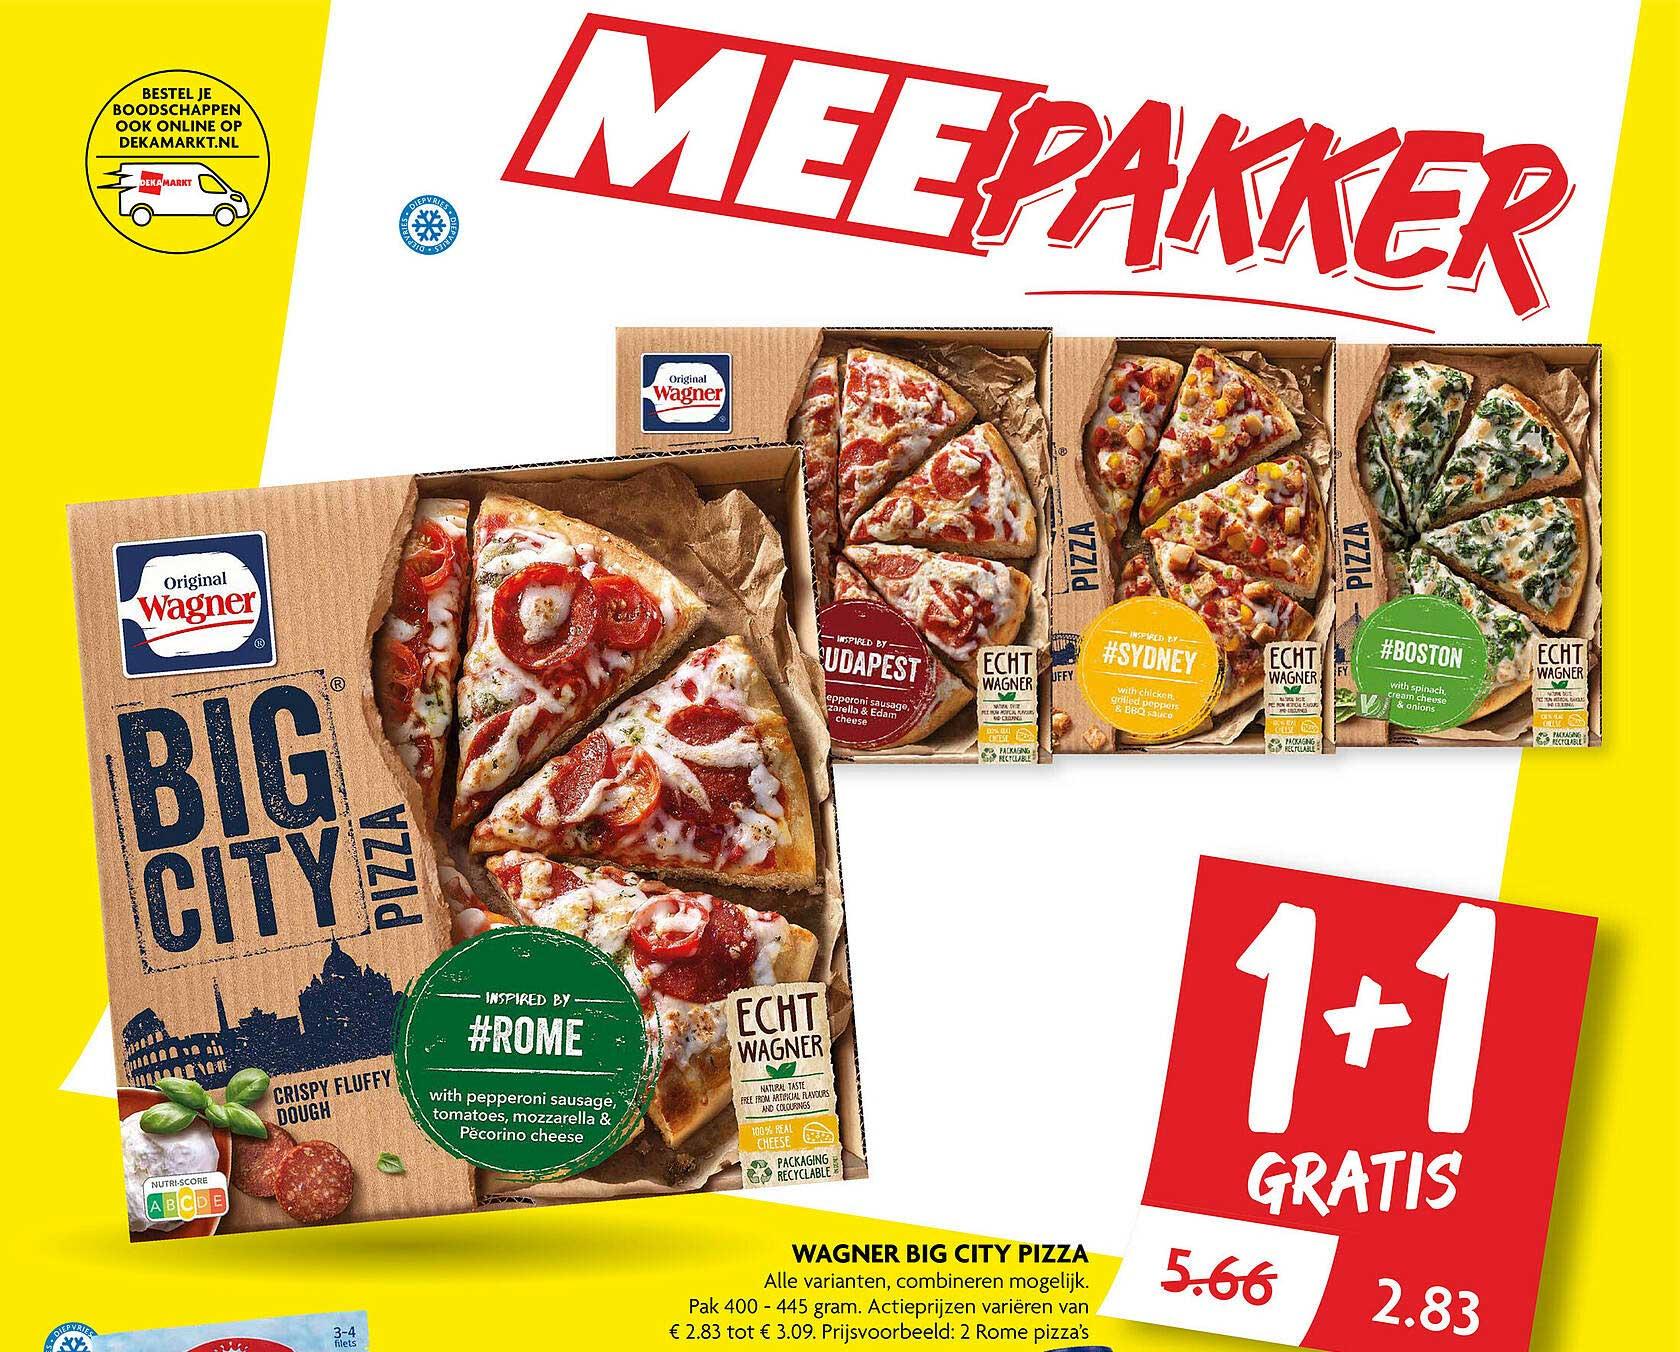 DekaMarkt Wagner Big City Pizza 1+1 Gratis